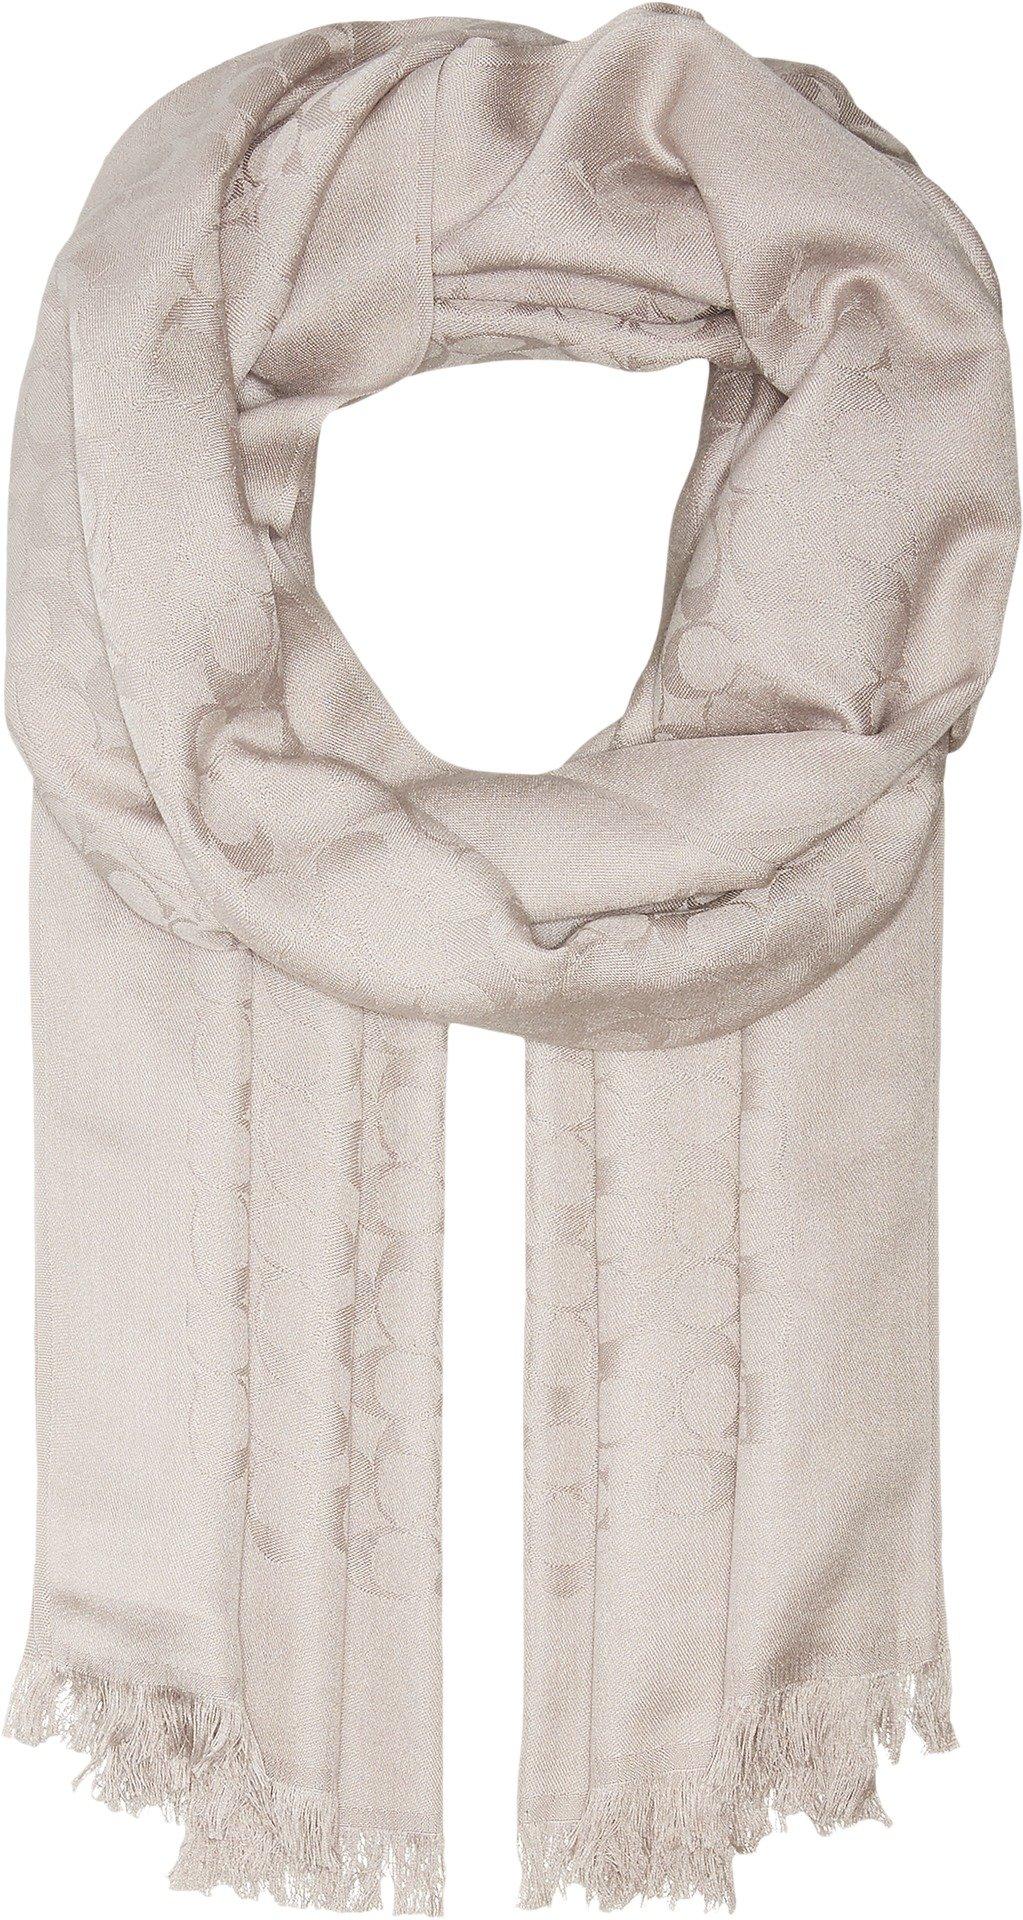 COACH Women's Signature Stole Grey One Size